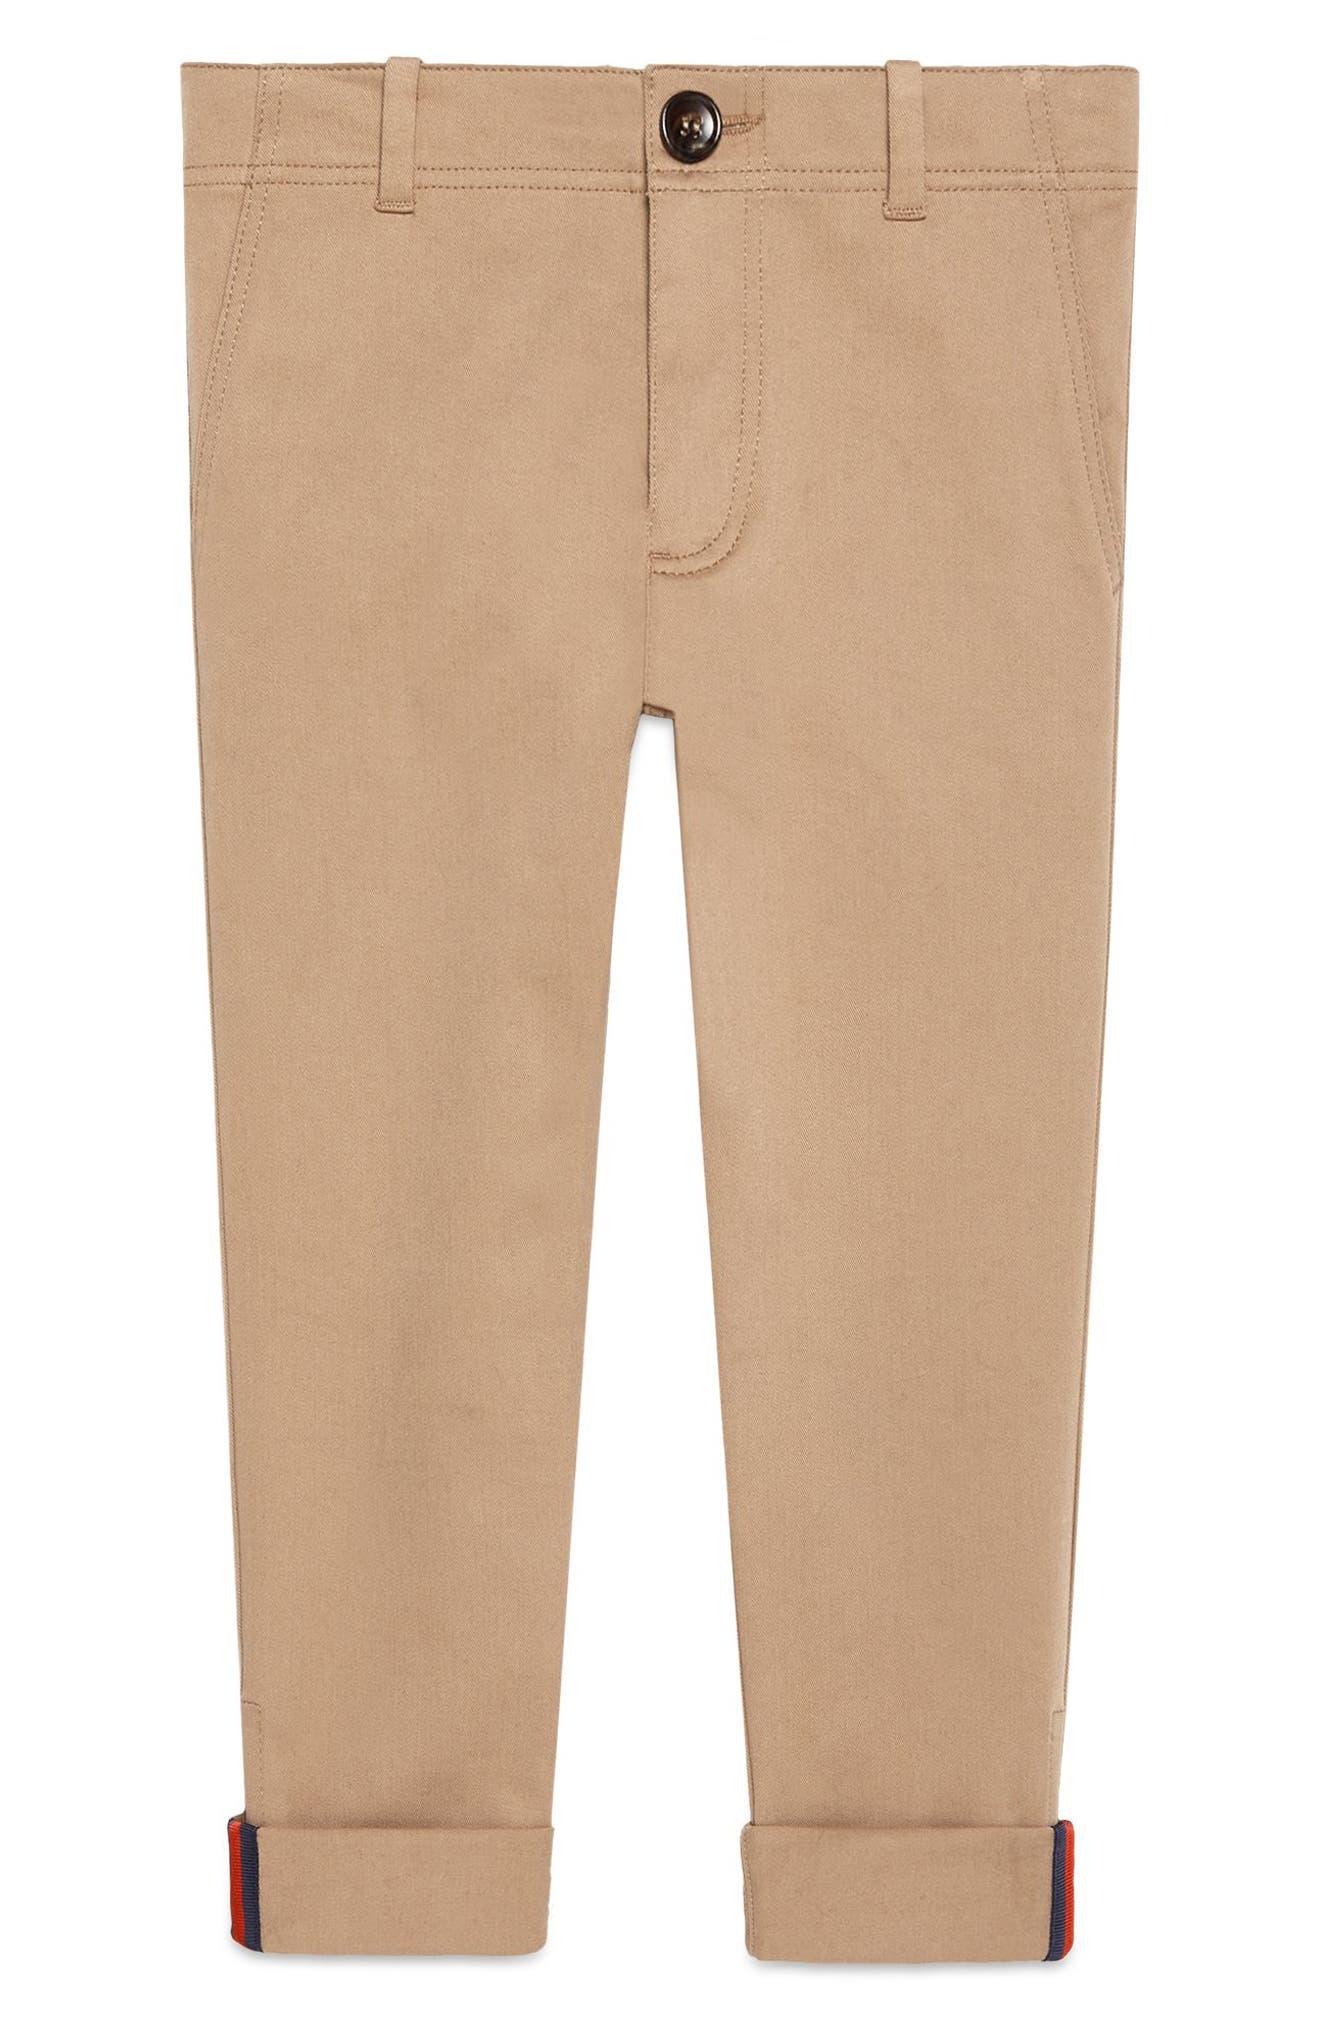 Urban Stripe Pants,                         Main,                         color, Sugarcane/ Blue/ Red